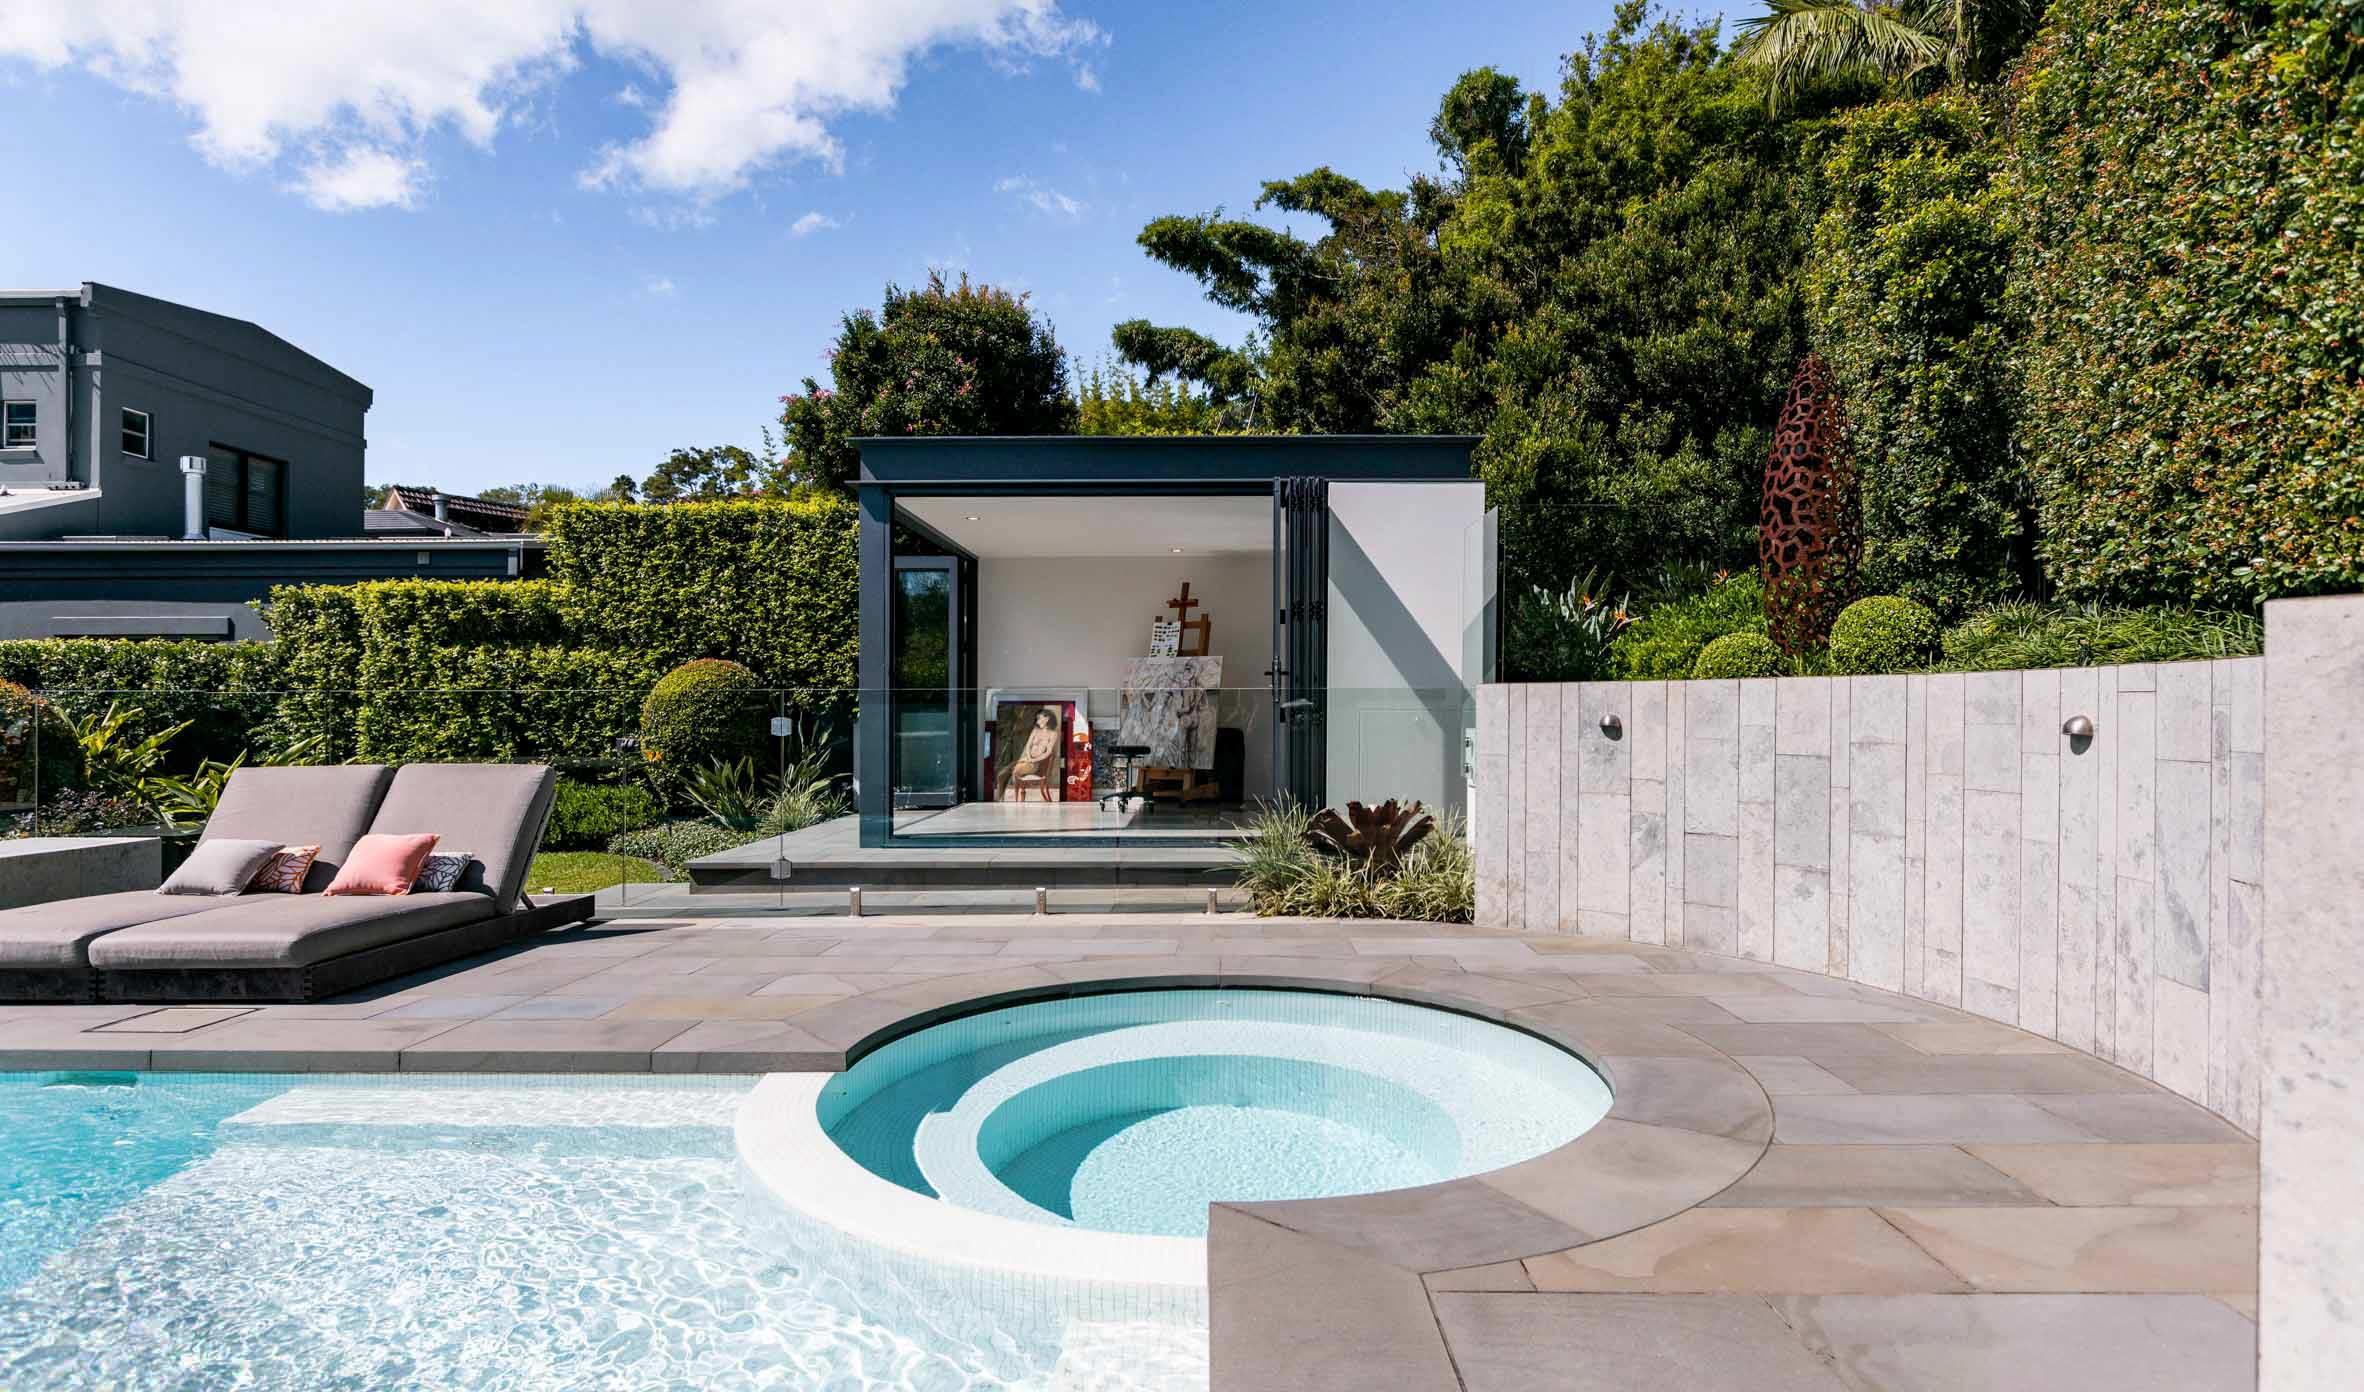 Pool-Tiles Thumbnails pool-tiles-33